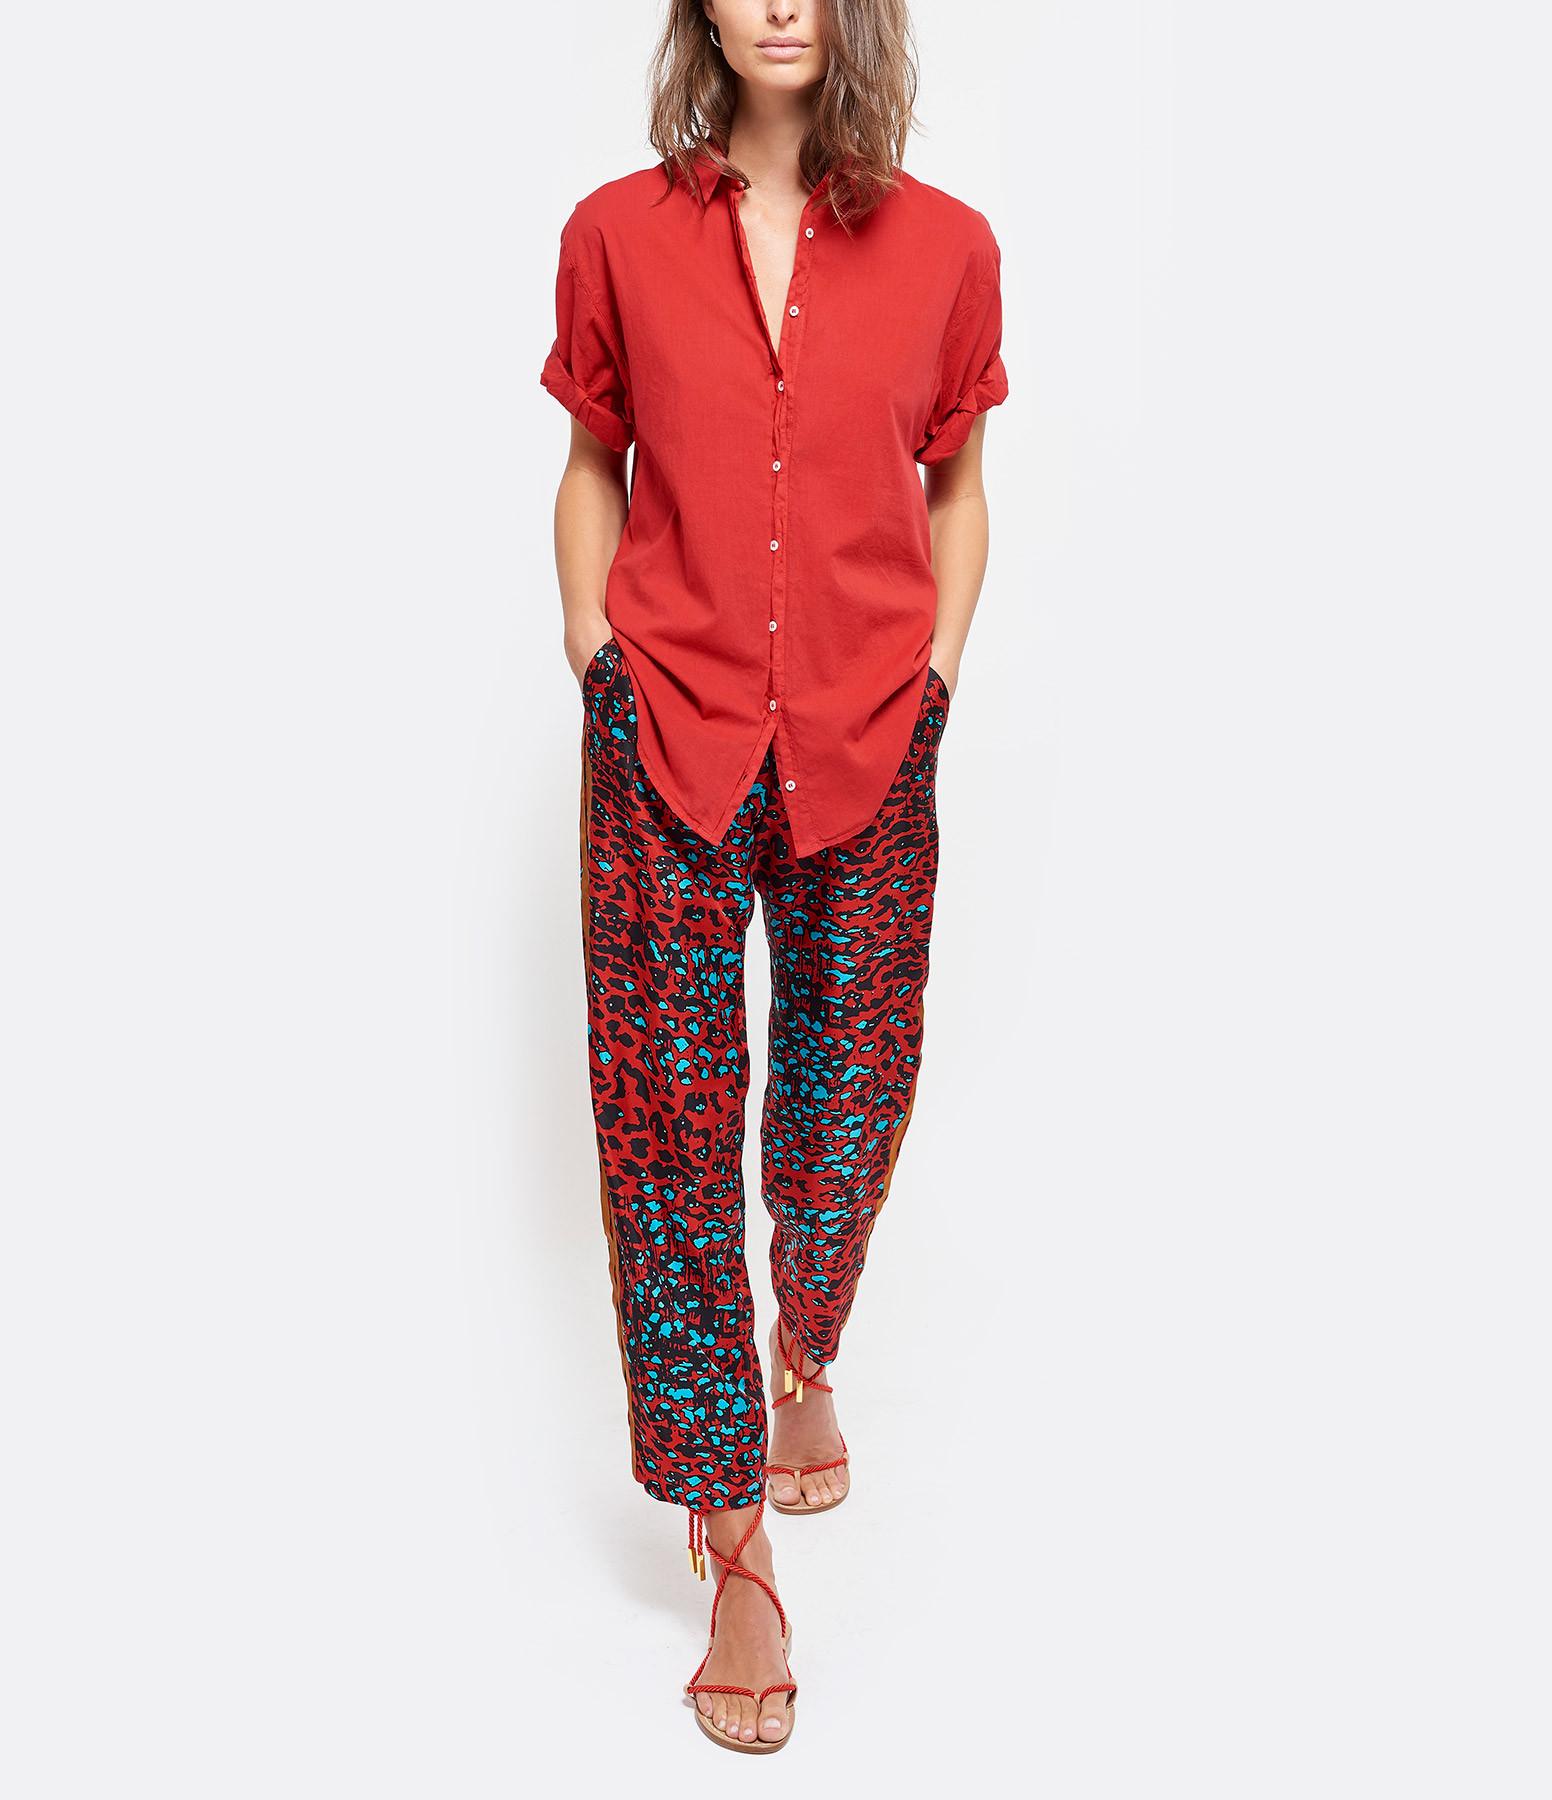 PIERRE-LOUIS MASCIA - Pantalon Aloe Soie Rouge Léopard